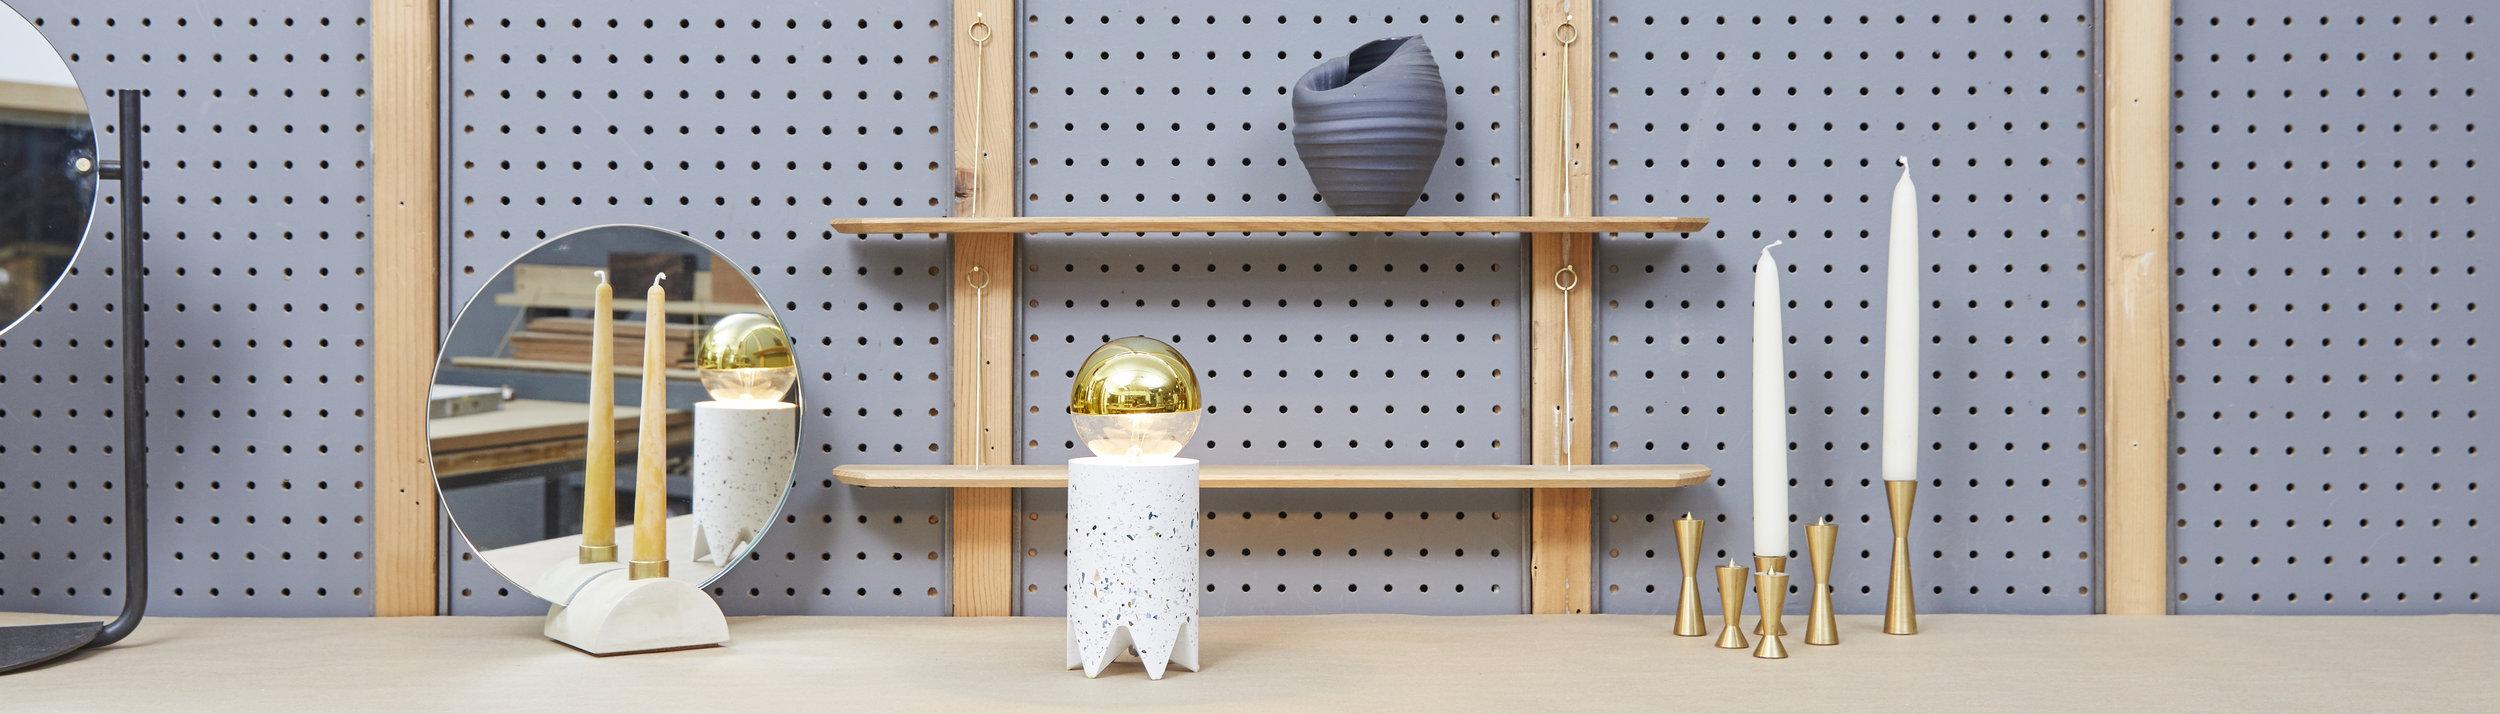 shook.ceramics and home.cover_03.jpg